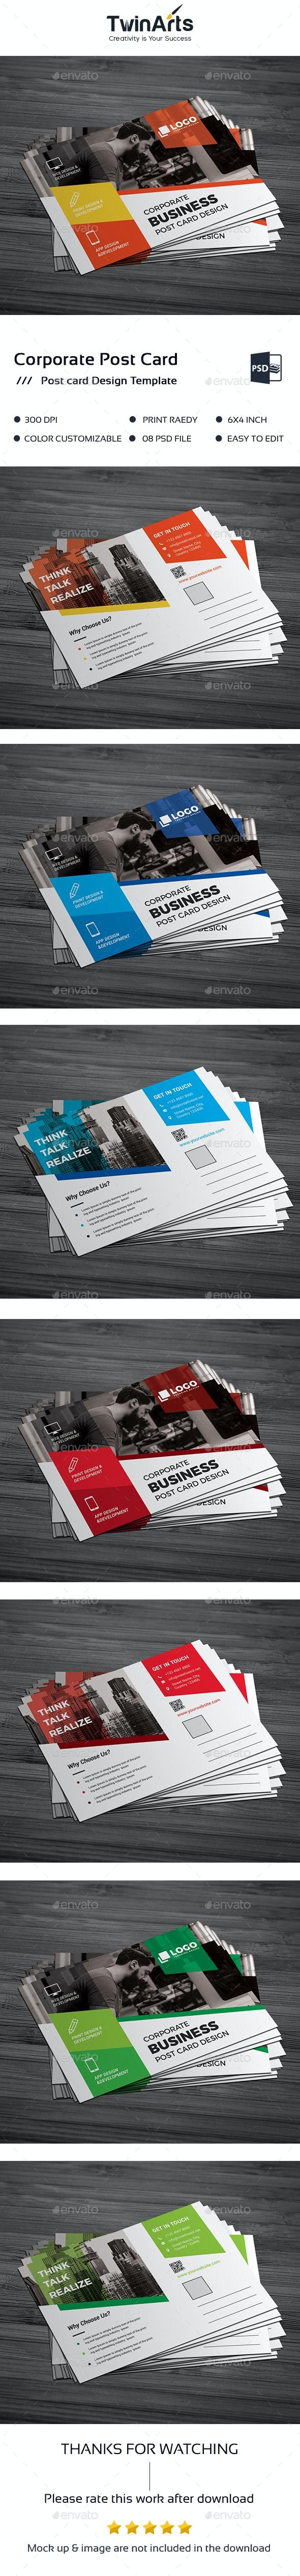 Corporate Post Card Design - Cards & Invites Print Templates